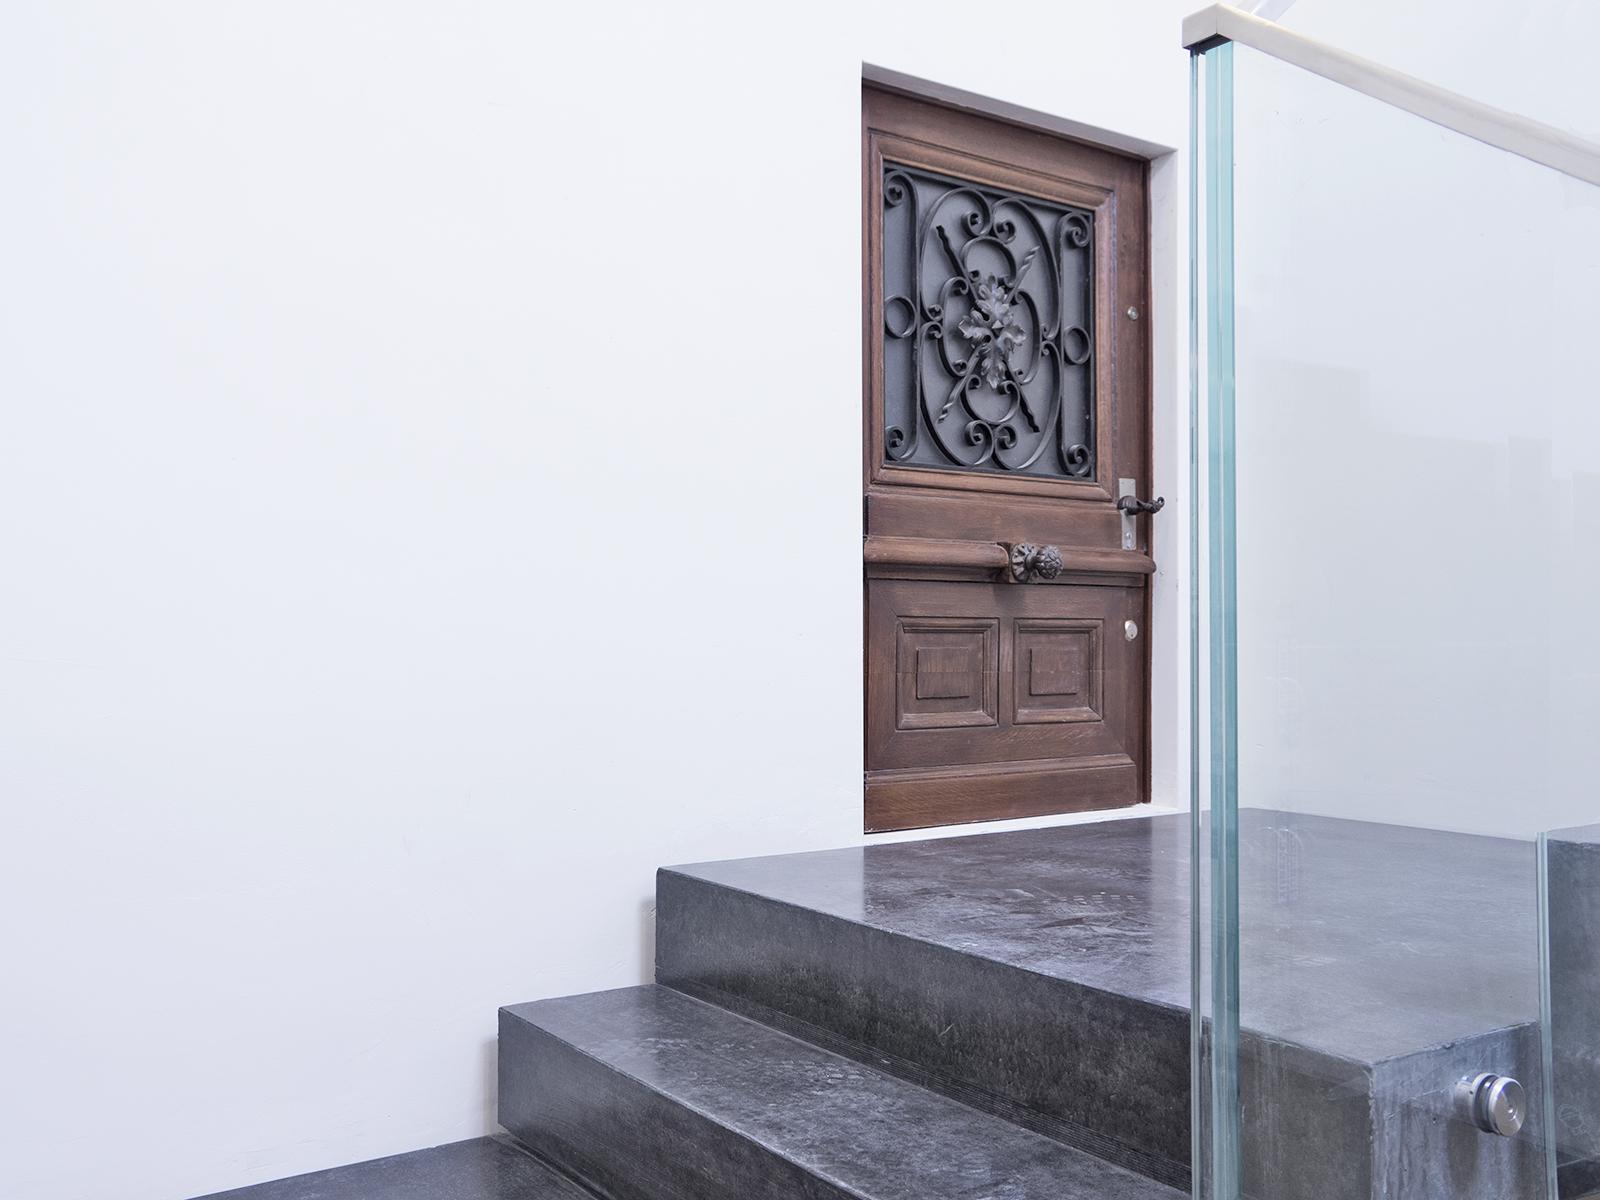 Benoit-Delaunay-artiste-sculptures-2011-Elapsed Time-05